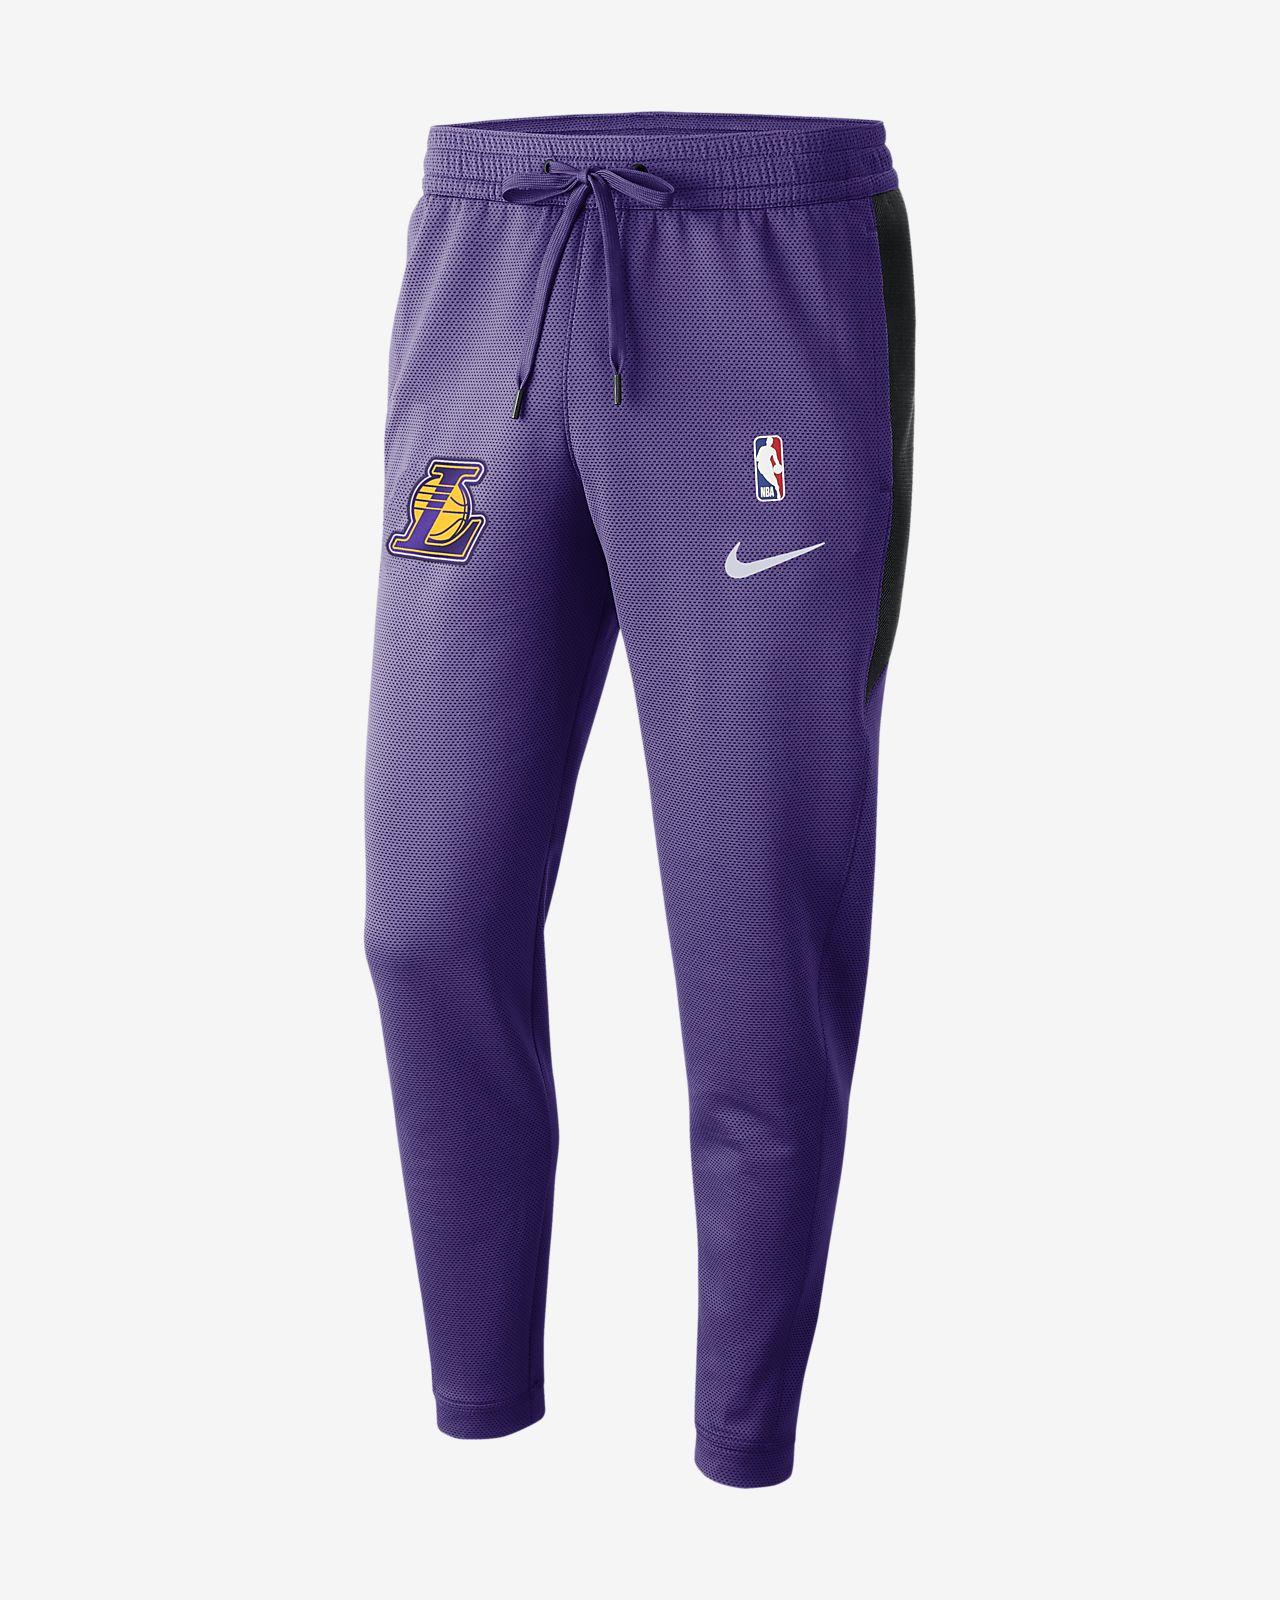 Angeles Showtime Pantalon Los Pour Flex Homme Nike Therma Lakers Nba qCwCEPf